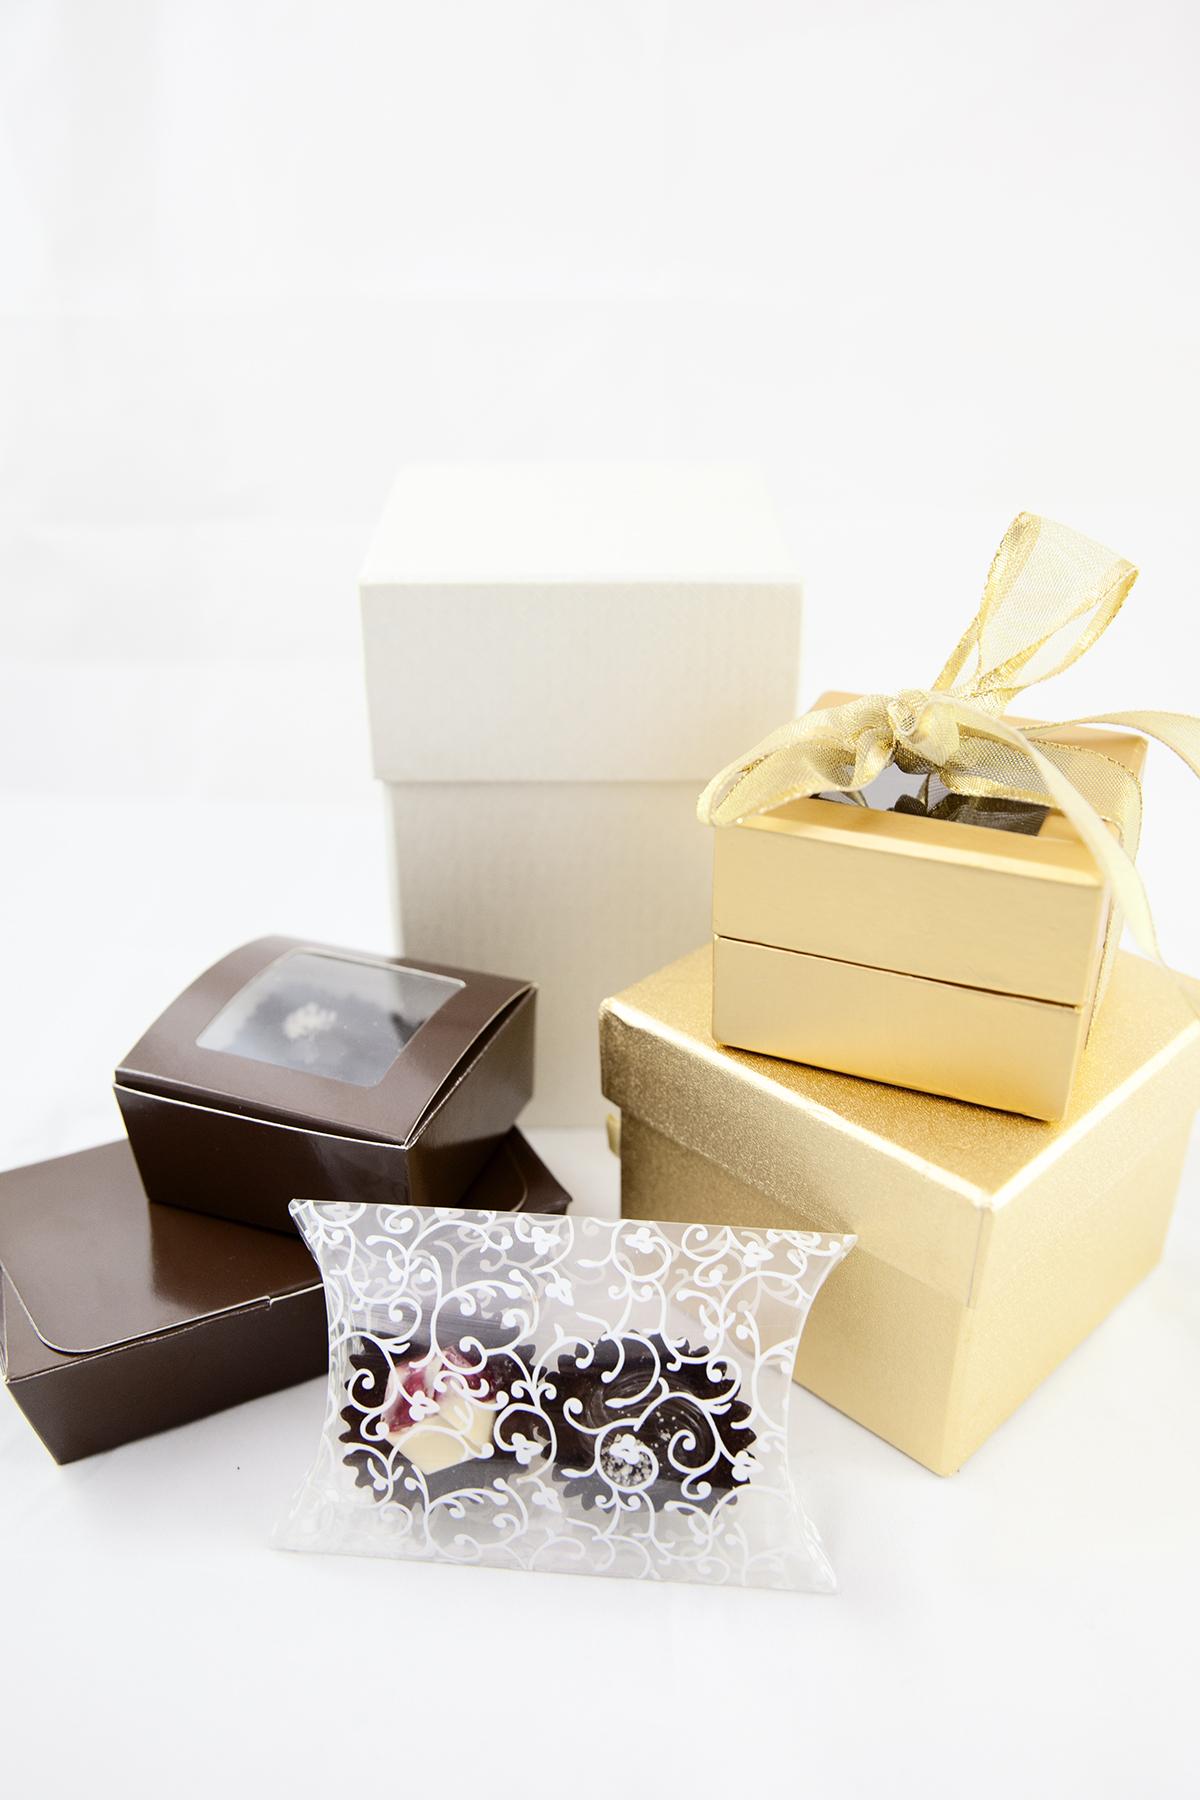 GiftBoxes_002.jpg